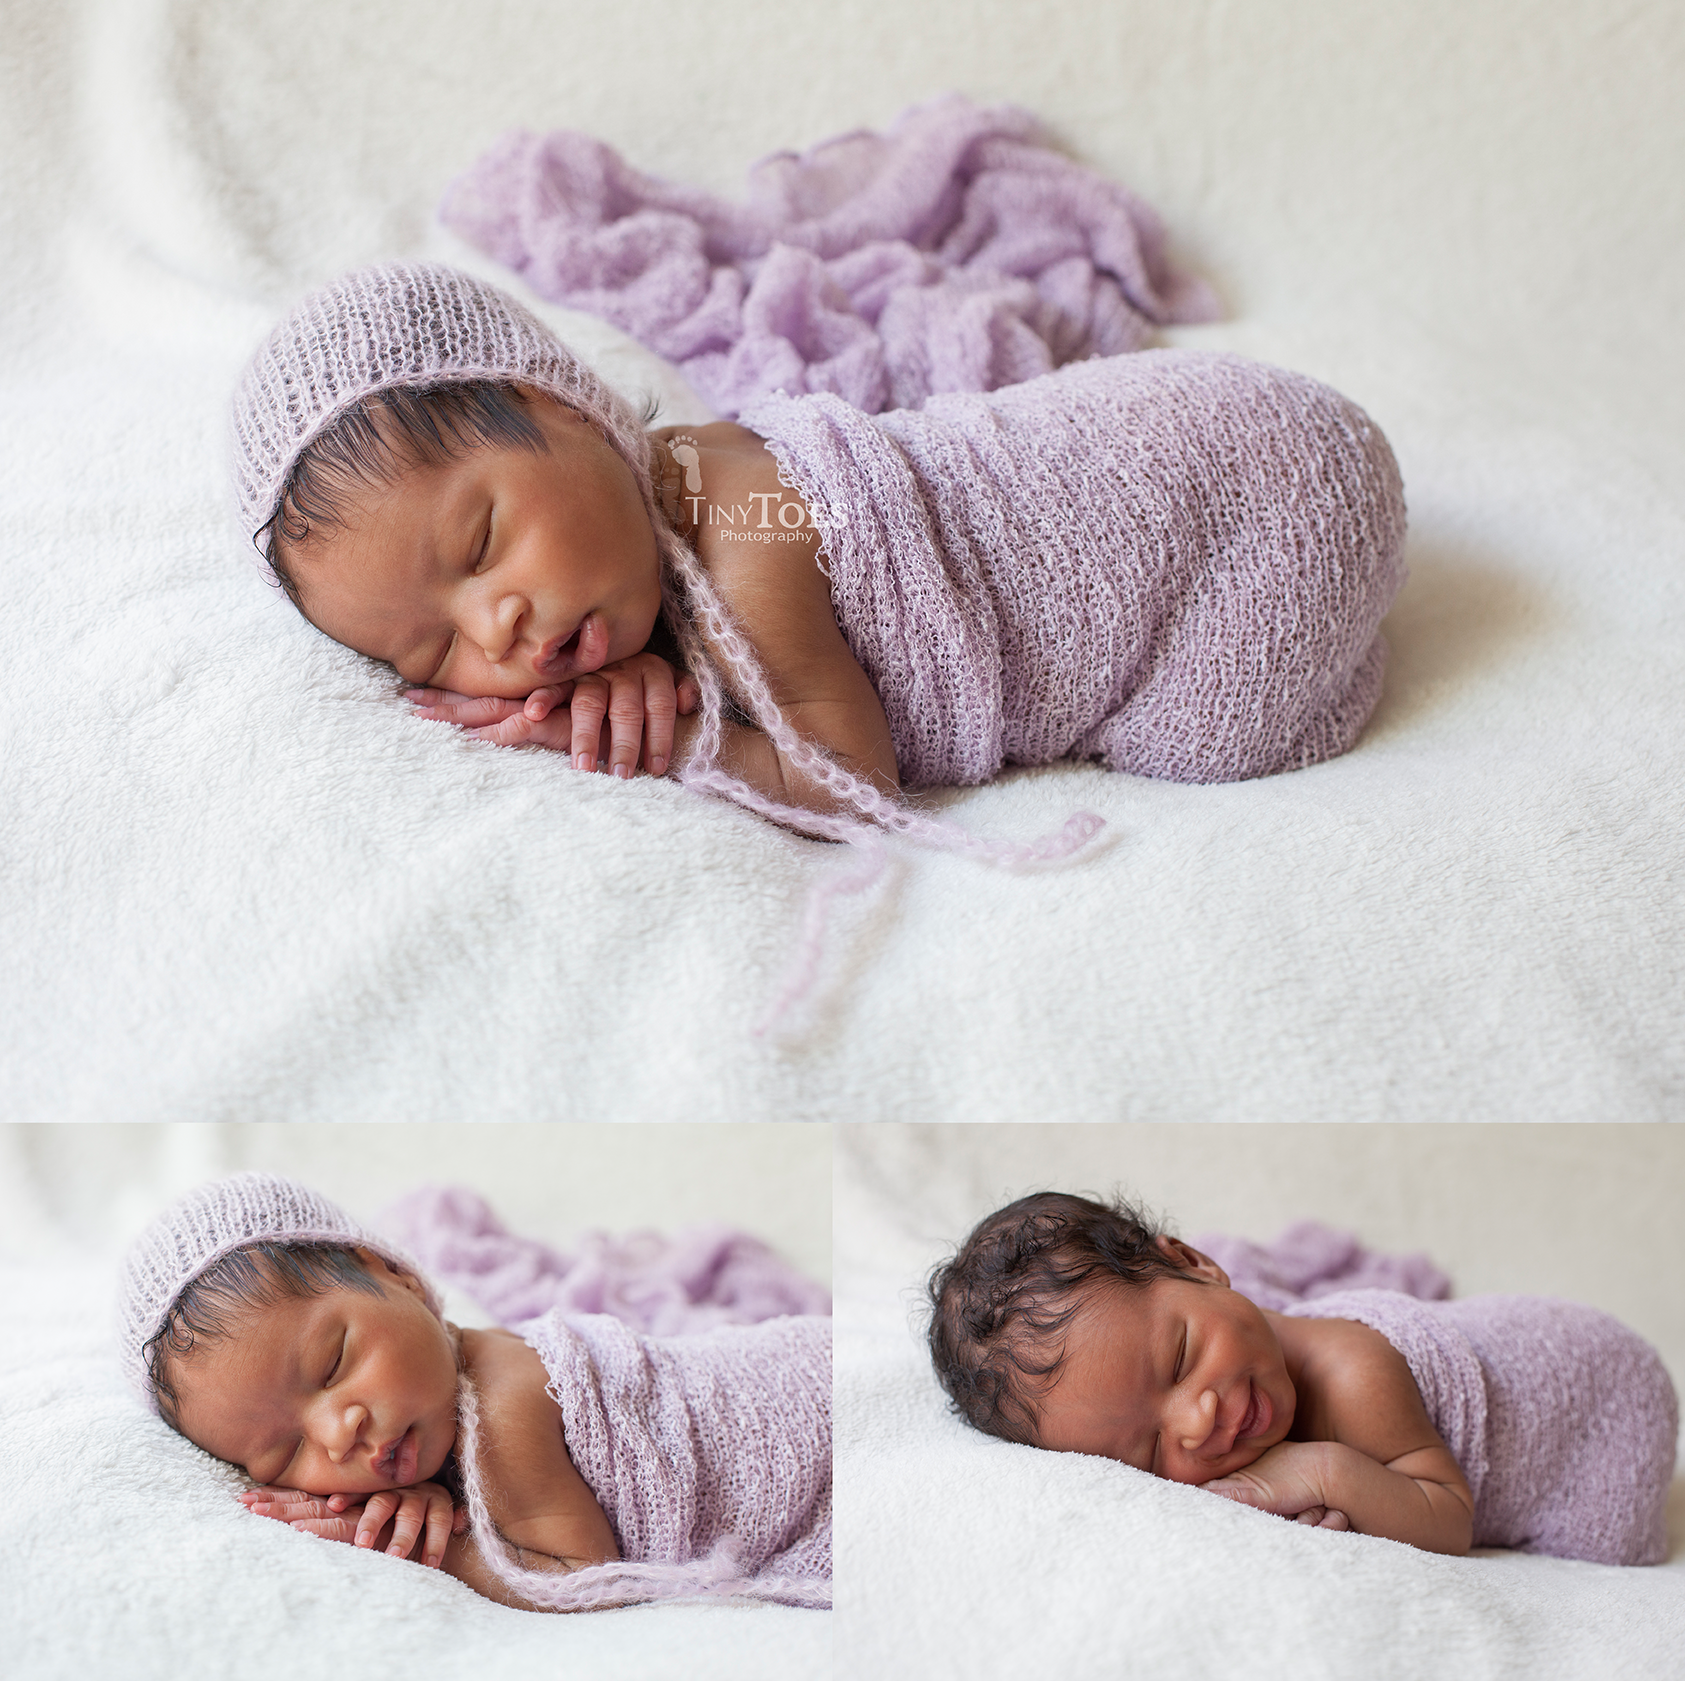 Tiny Toes Photography | Nassau, Bahamas Maternity & Newborn Photographer